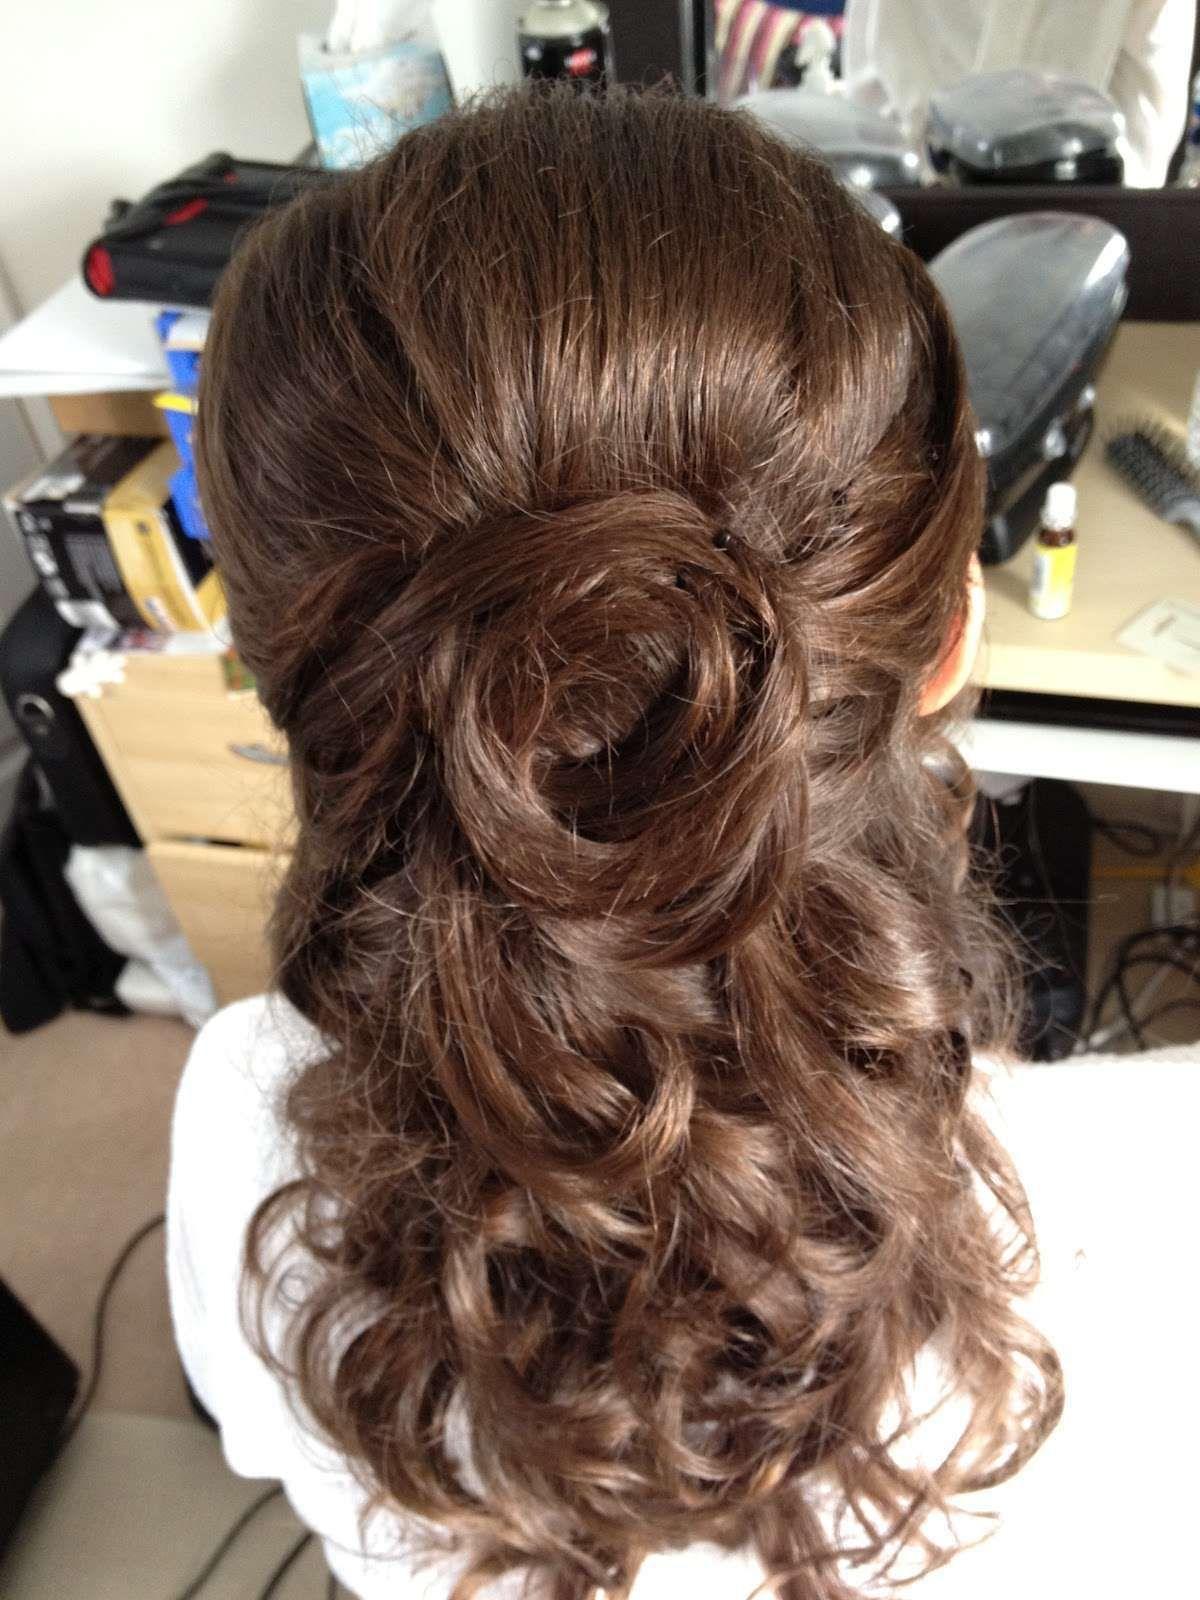 Half up down wedding hairstyles wedding hair styles pinterest